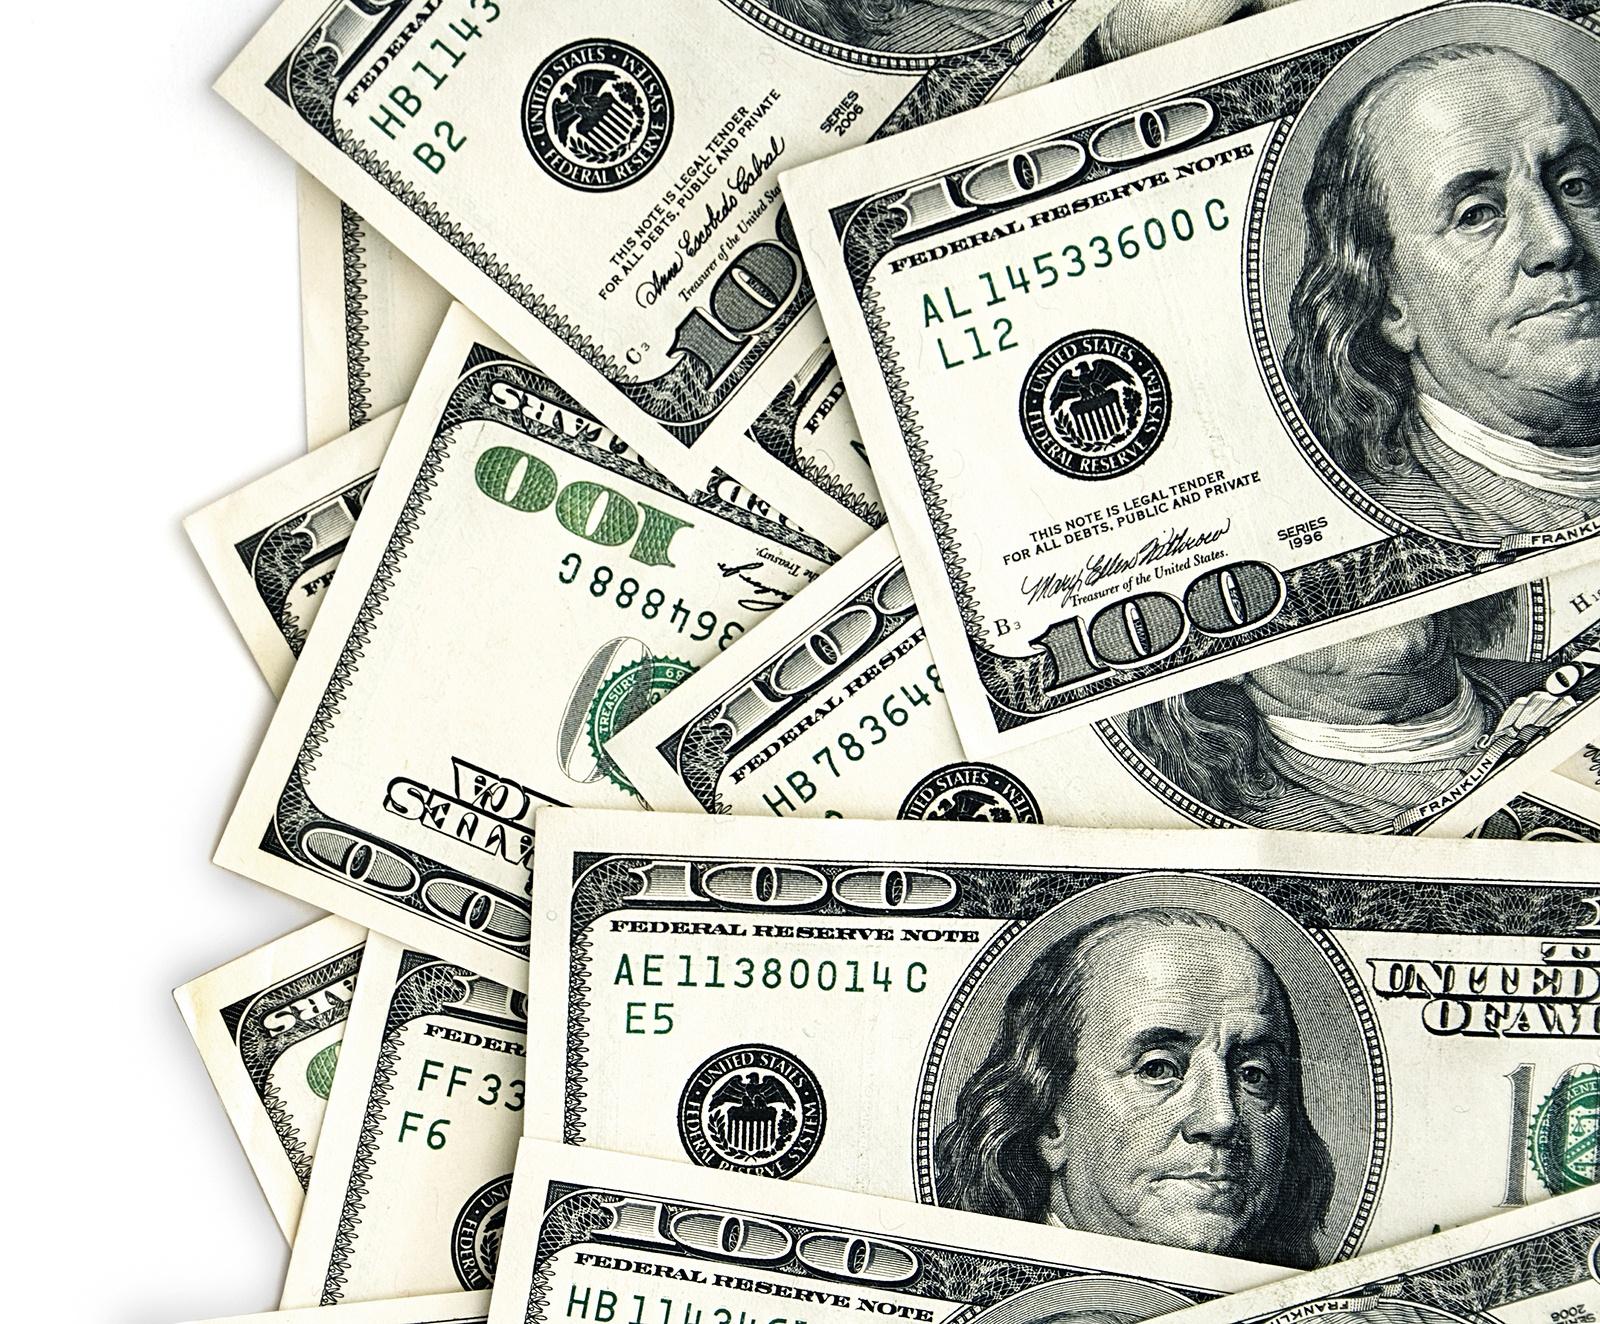 bigstock-money-background-12354119.jpg